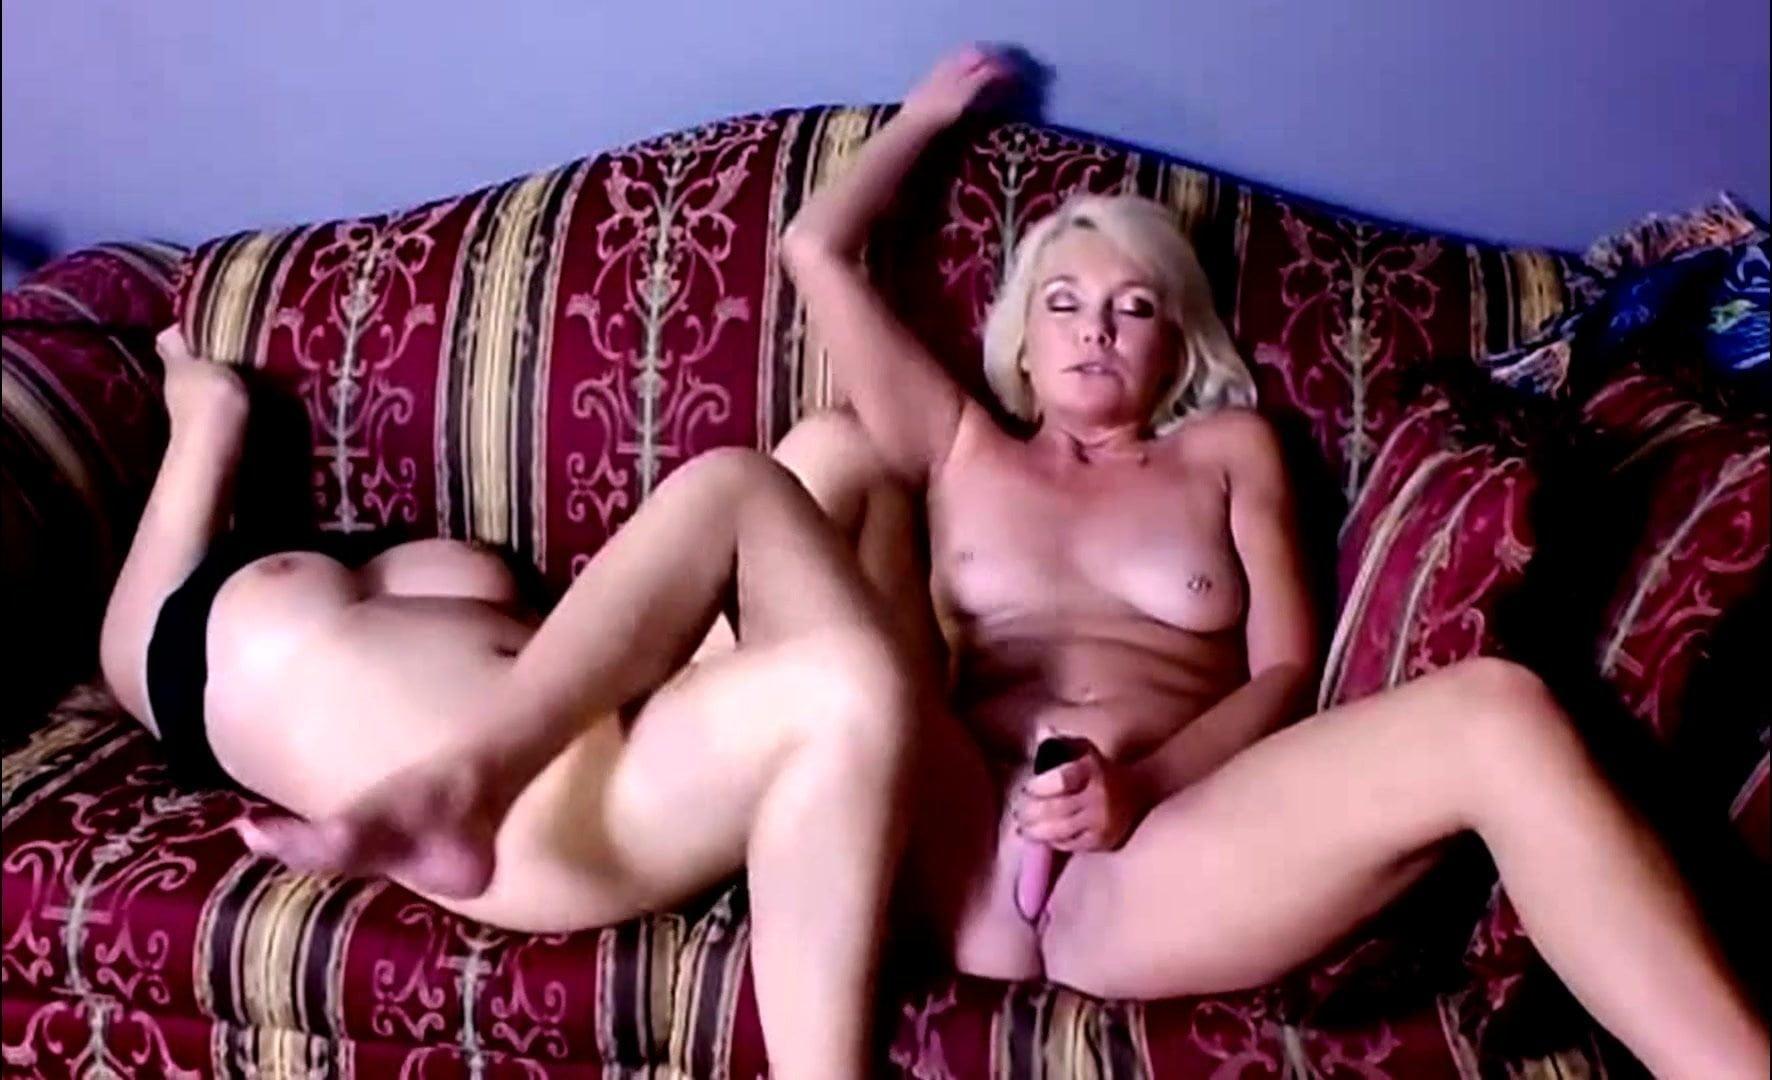 English wine sex video hardcore free